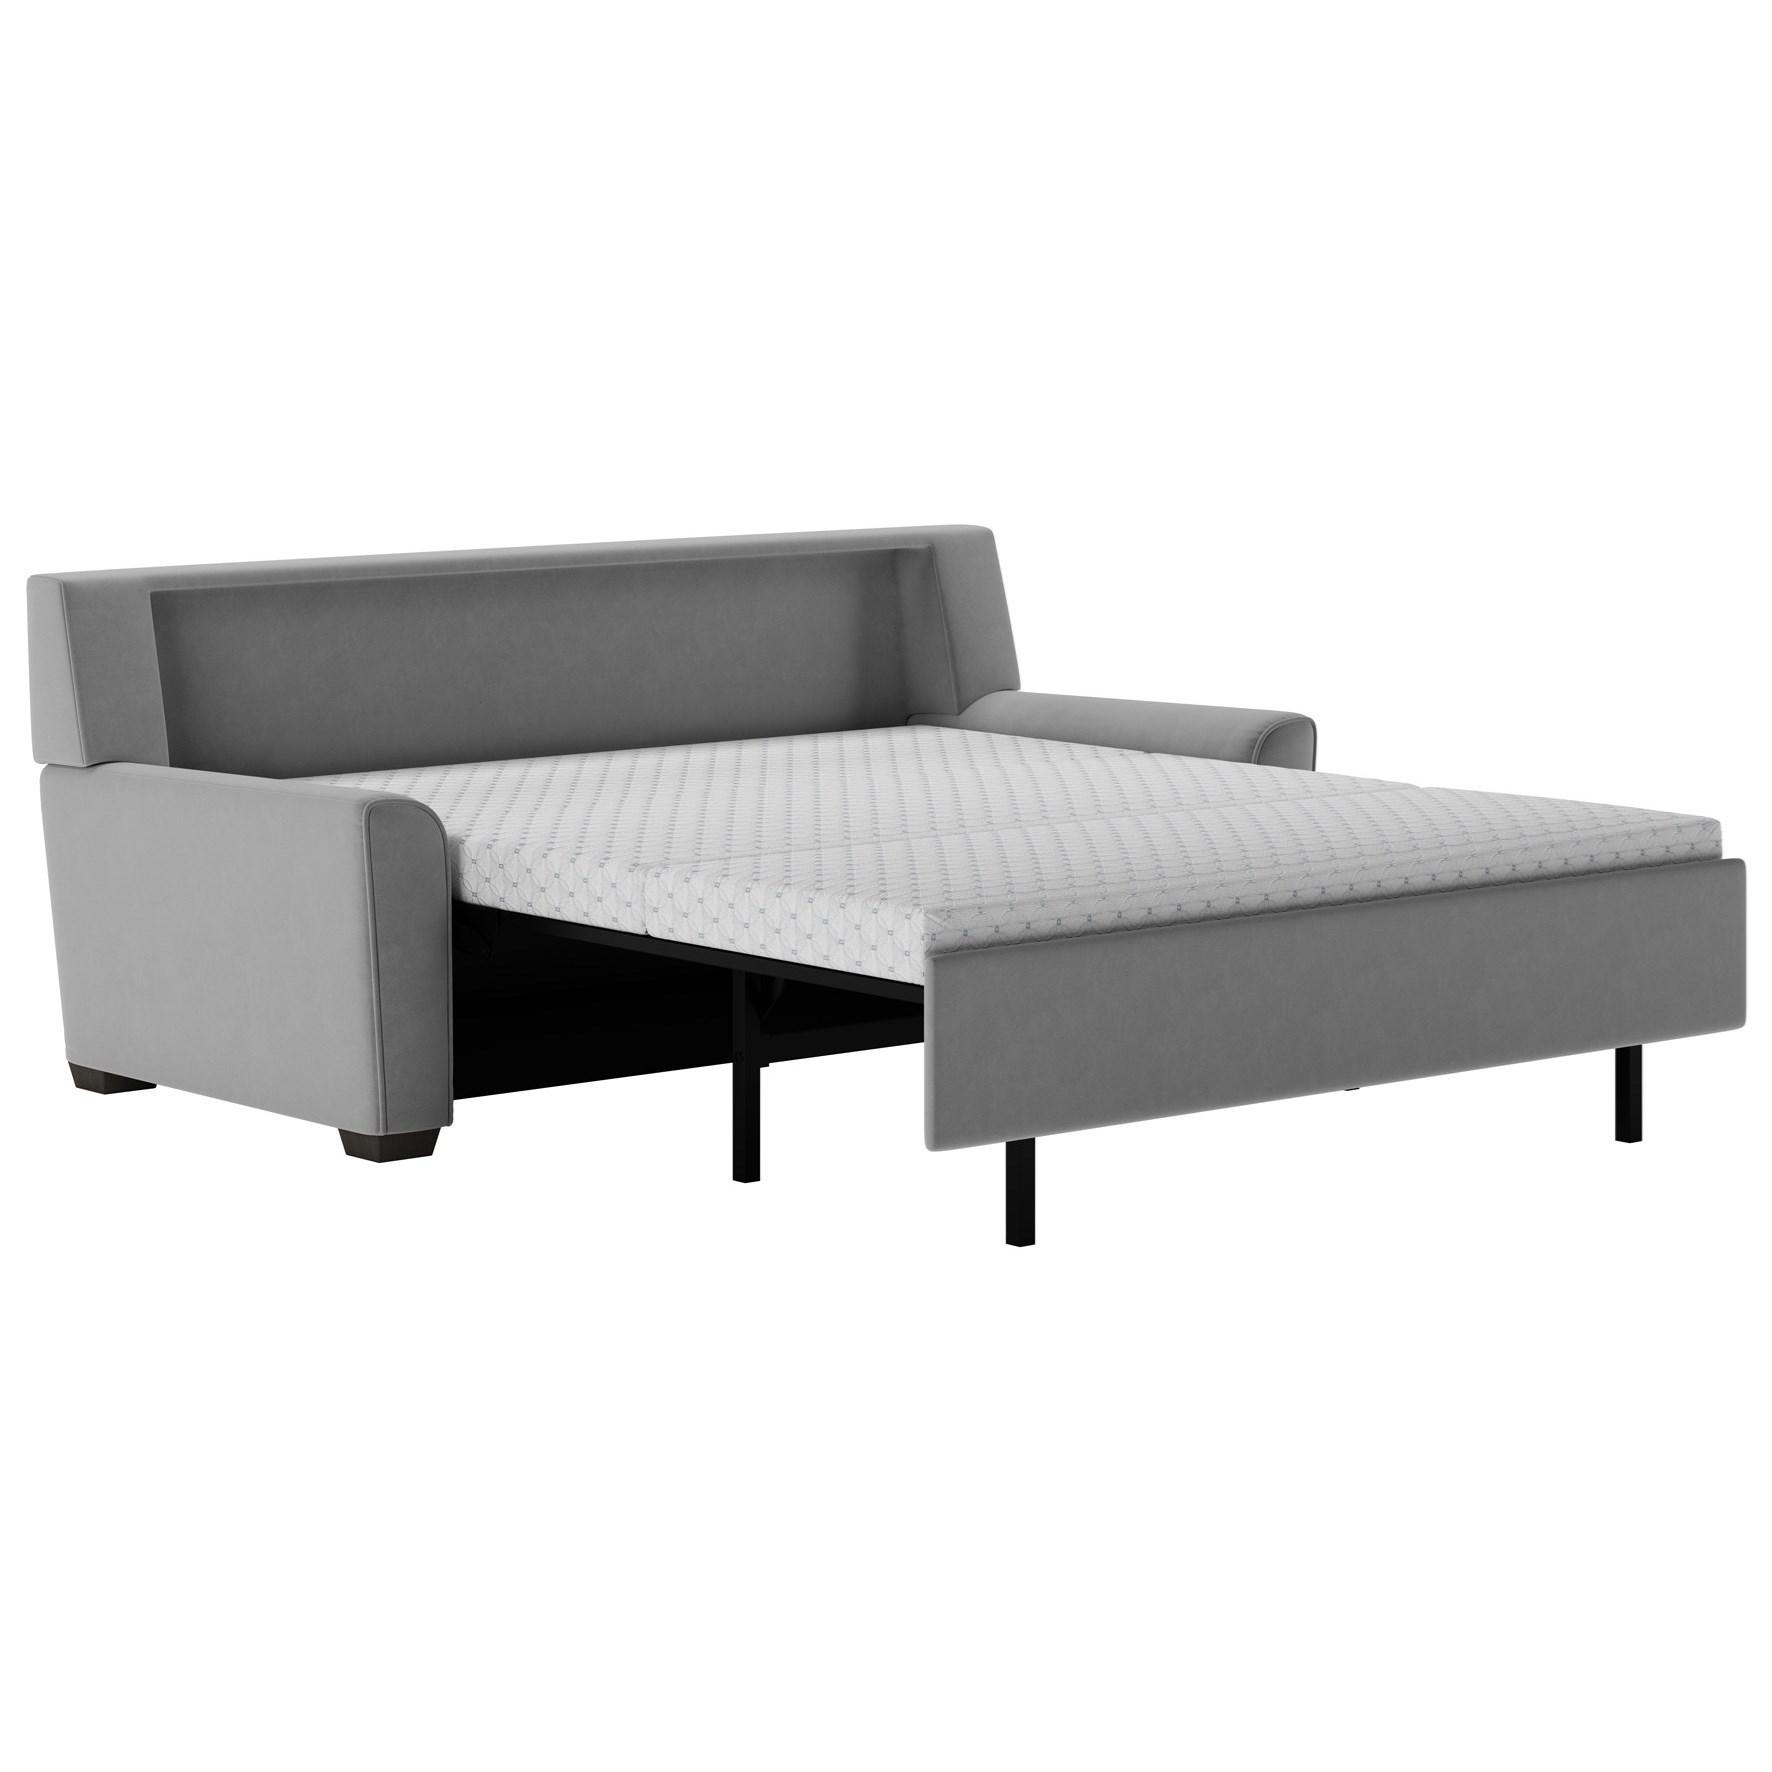 american leather klein king size comfort sleeper sofa jacksonville furniture mart sleeper sofas. Black Bedroom Furniture Sets. Home Design Ideas